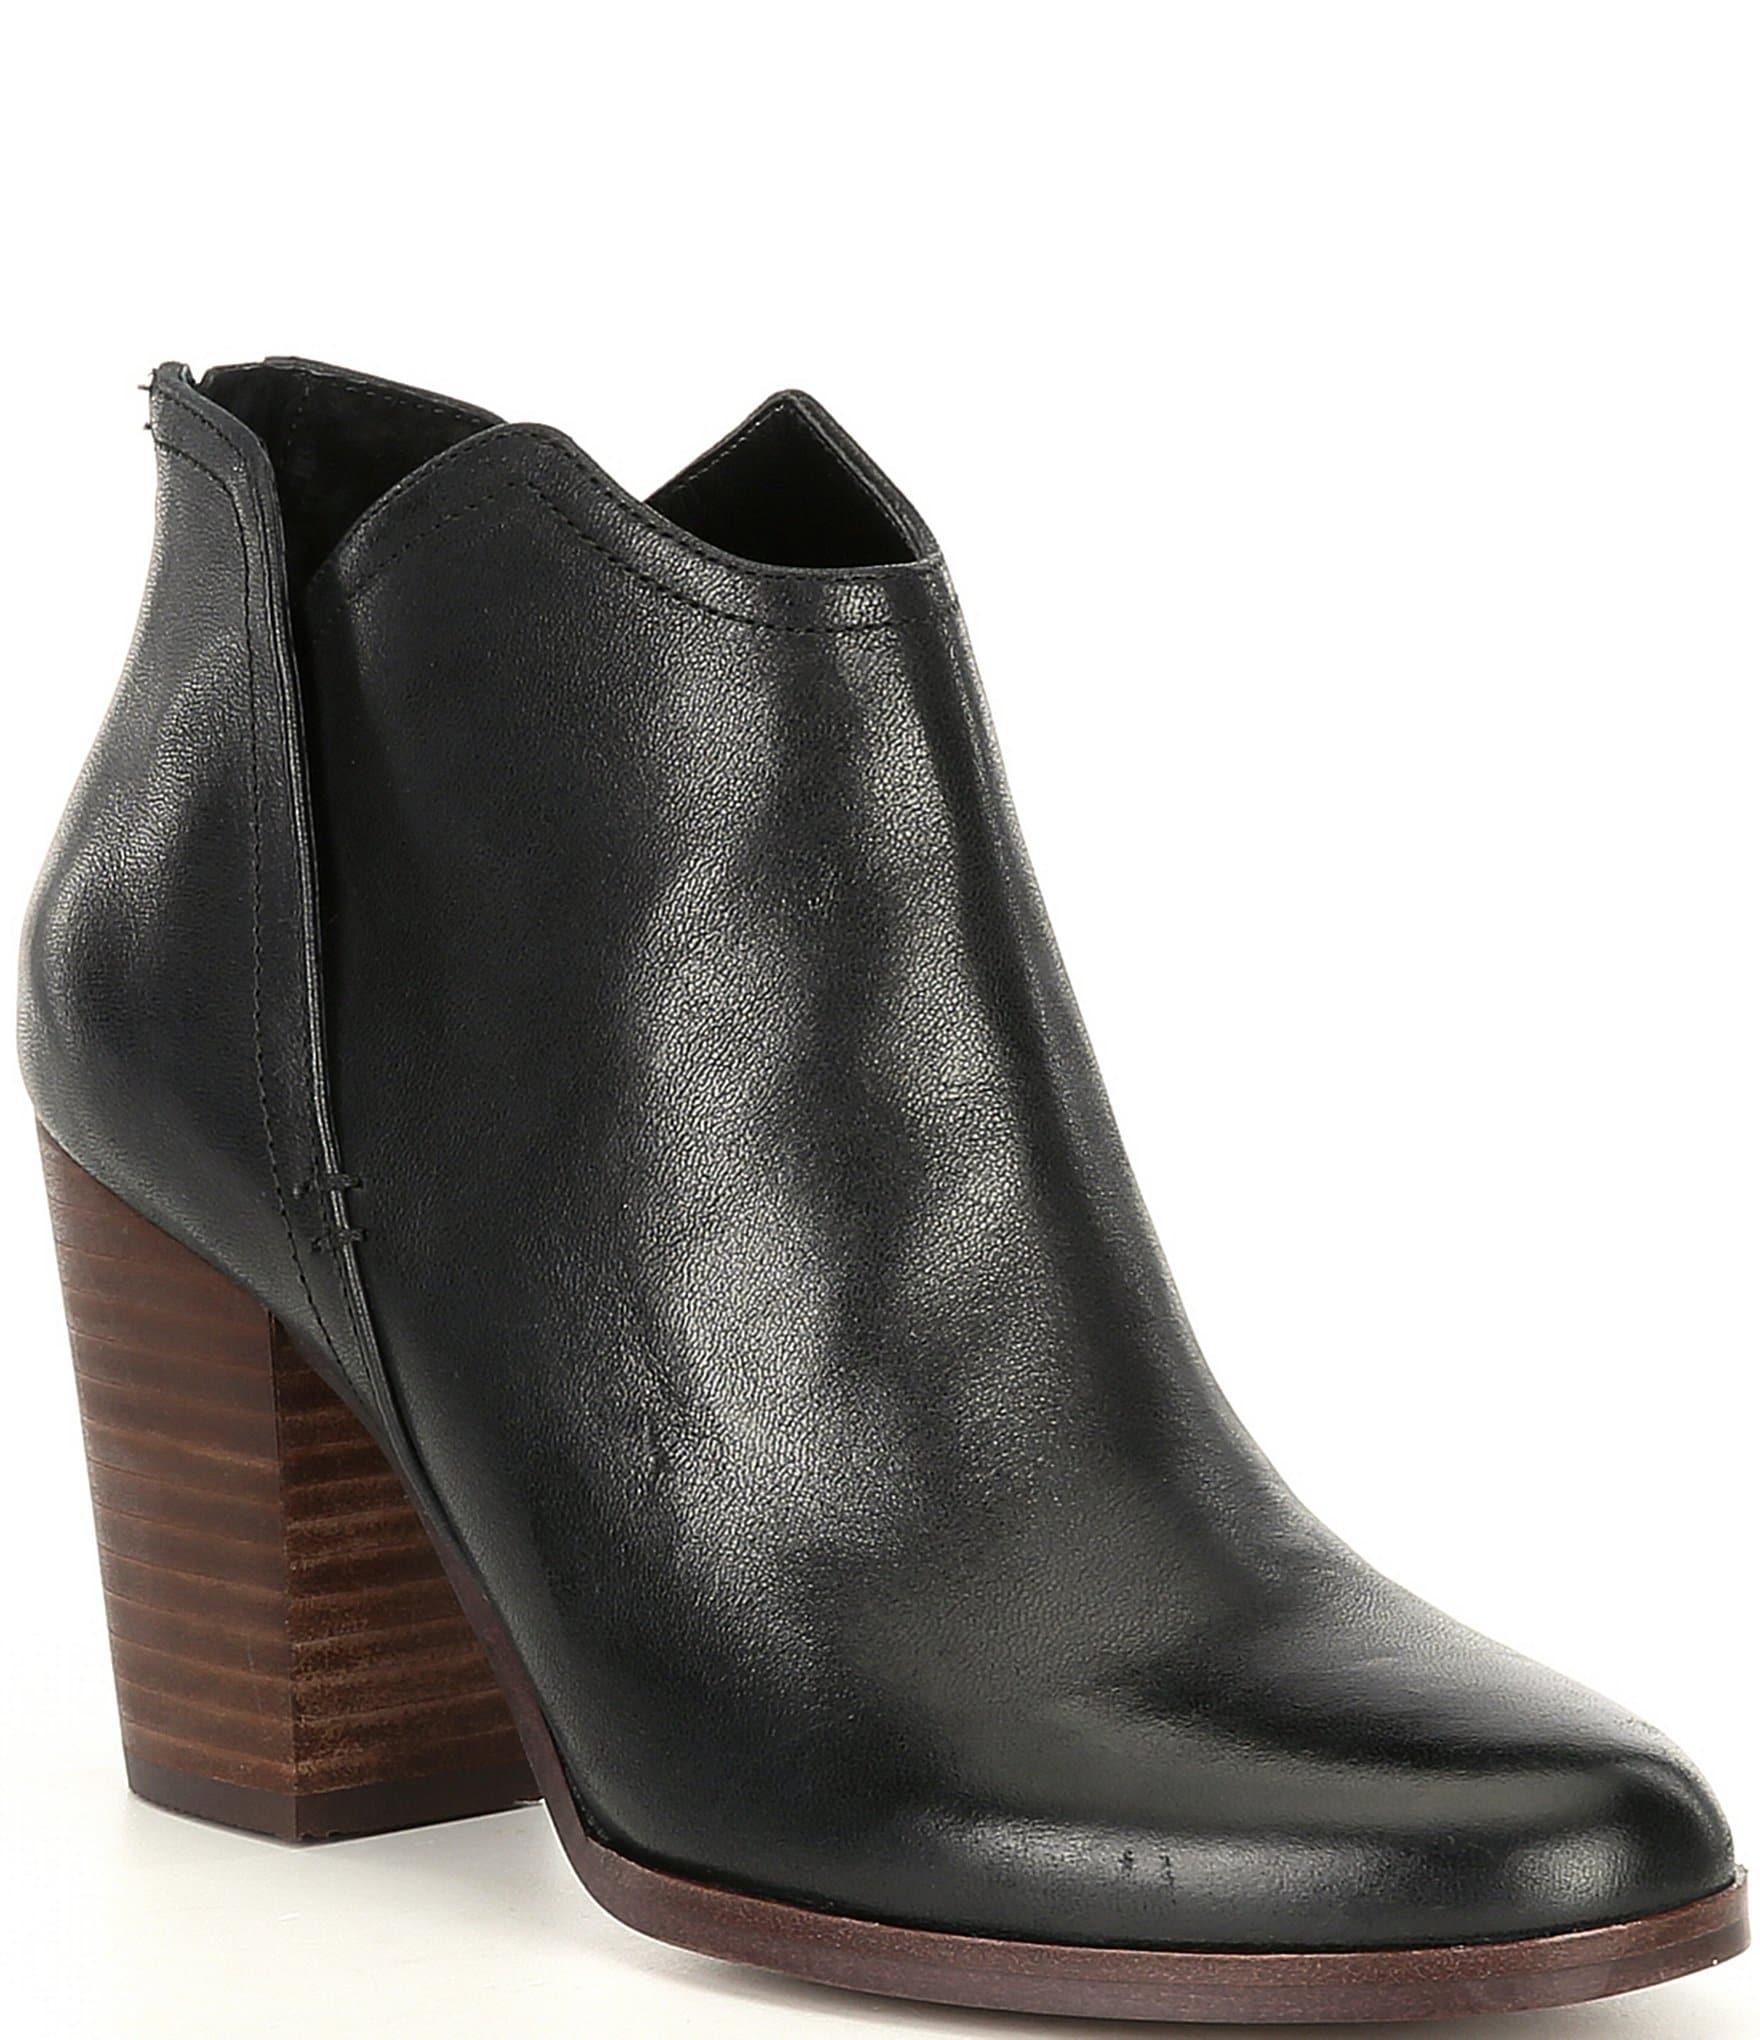 GB Black Women's Shoes   Dillard's